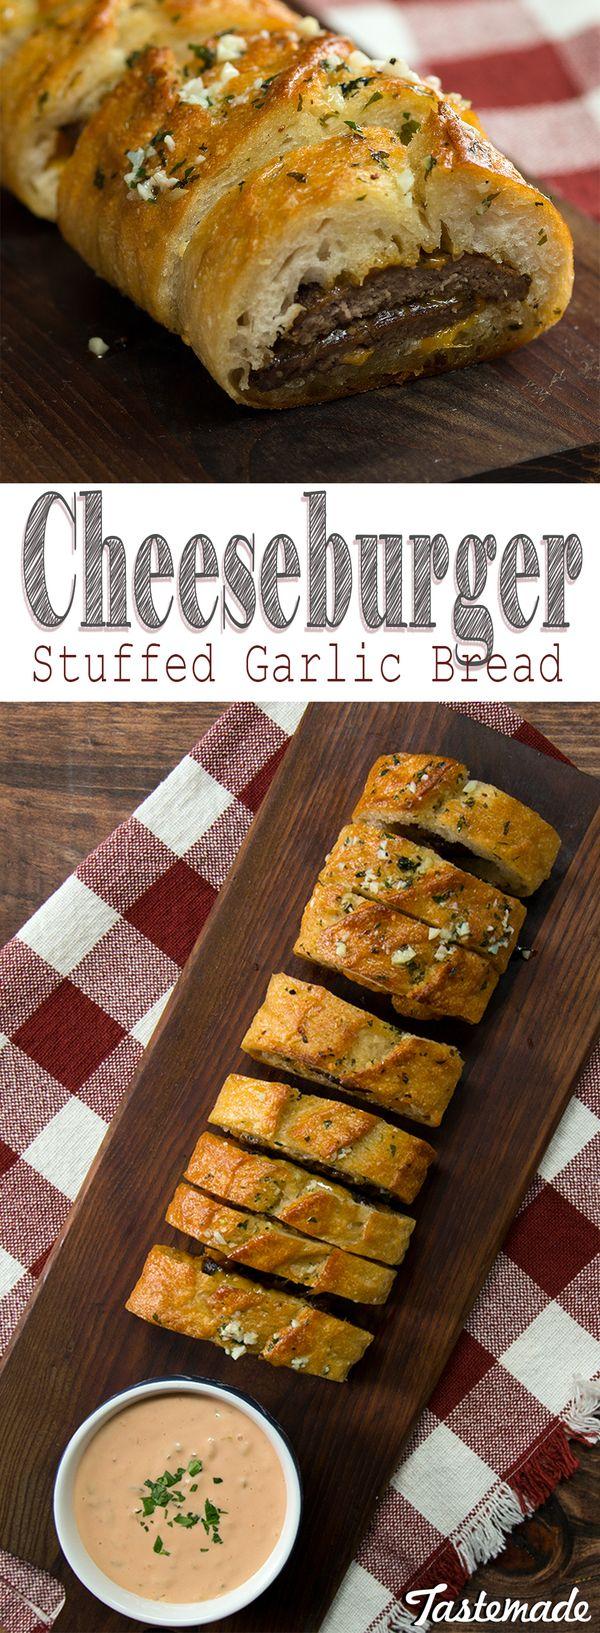 Cheeseburger-Stuffed Garlic Bread